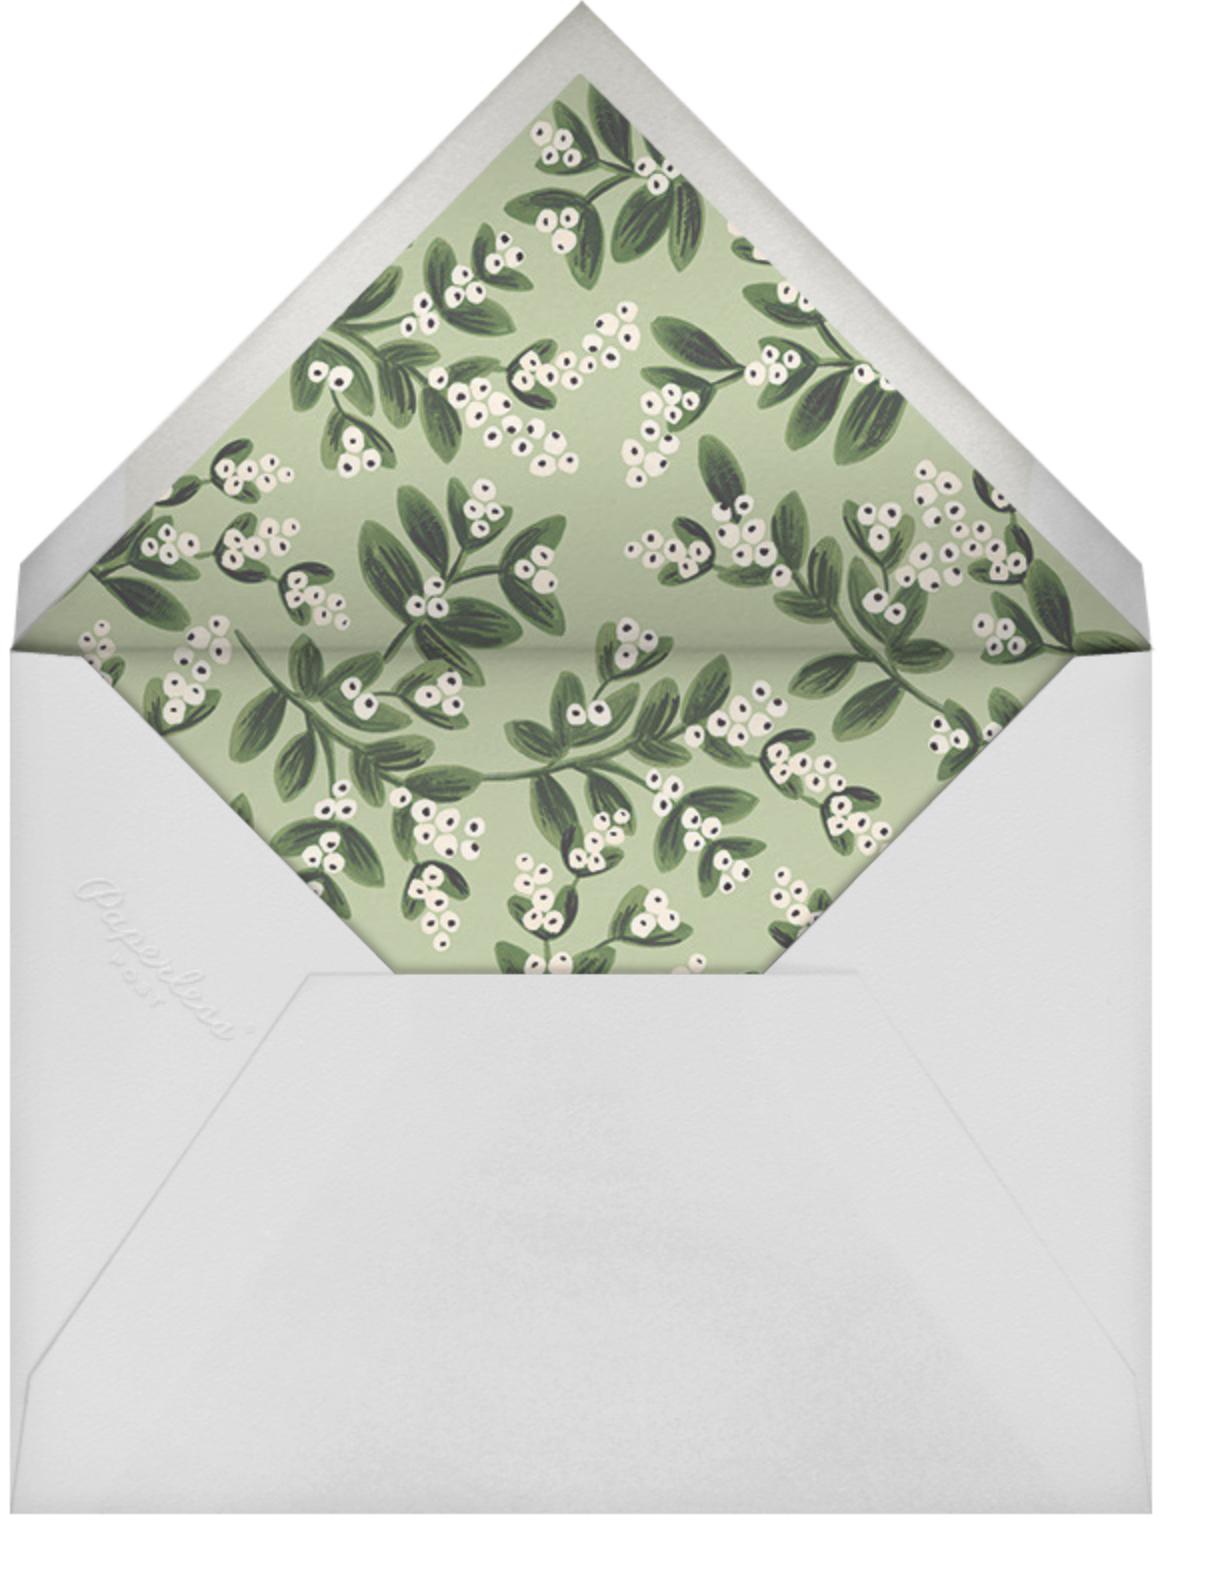 Mistletoe Accent Flourish (Landscape Photo) - Spruce - Rifle Paper Co. - Holiday cards - envelope back